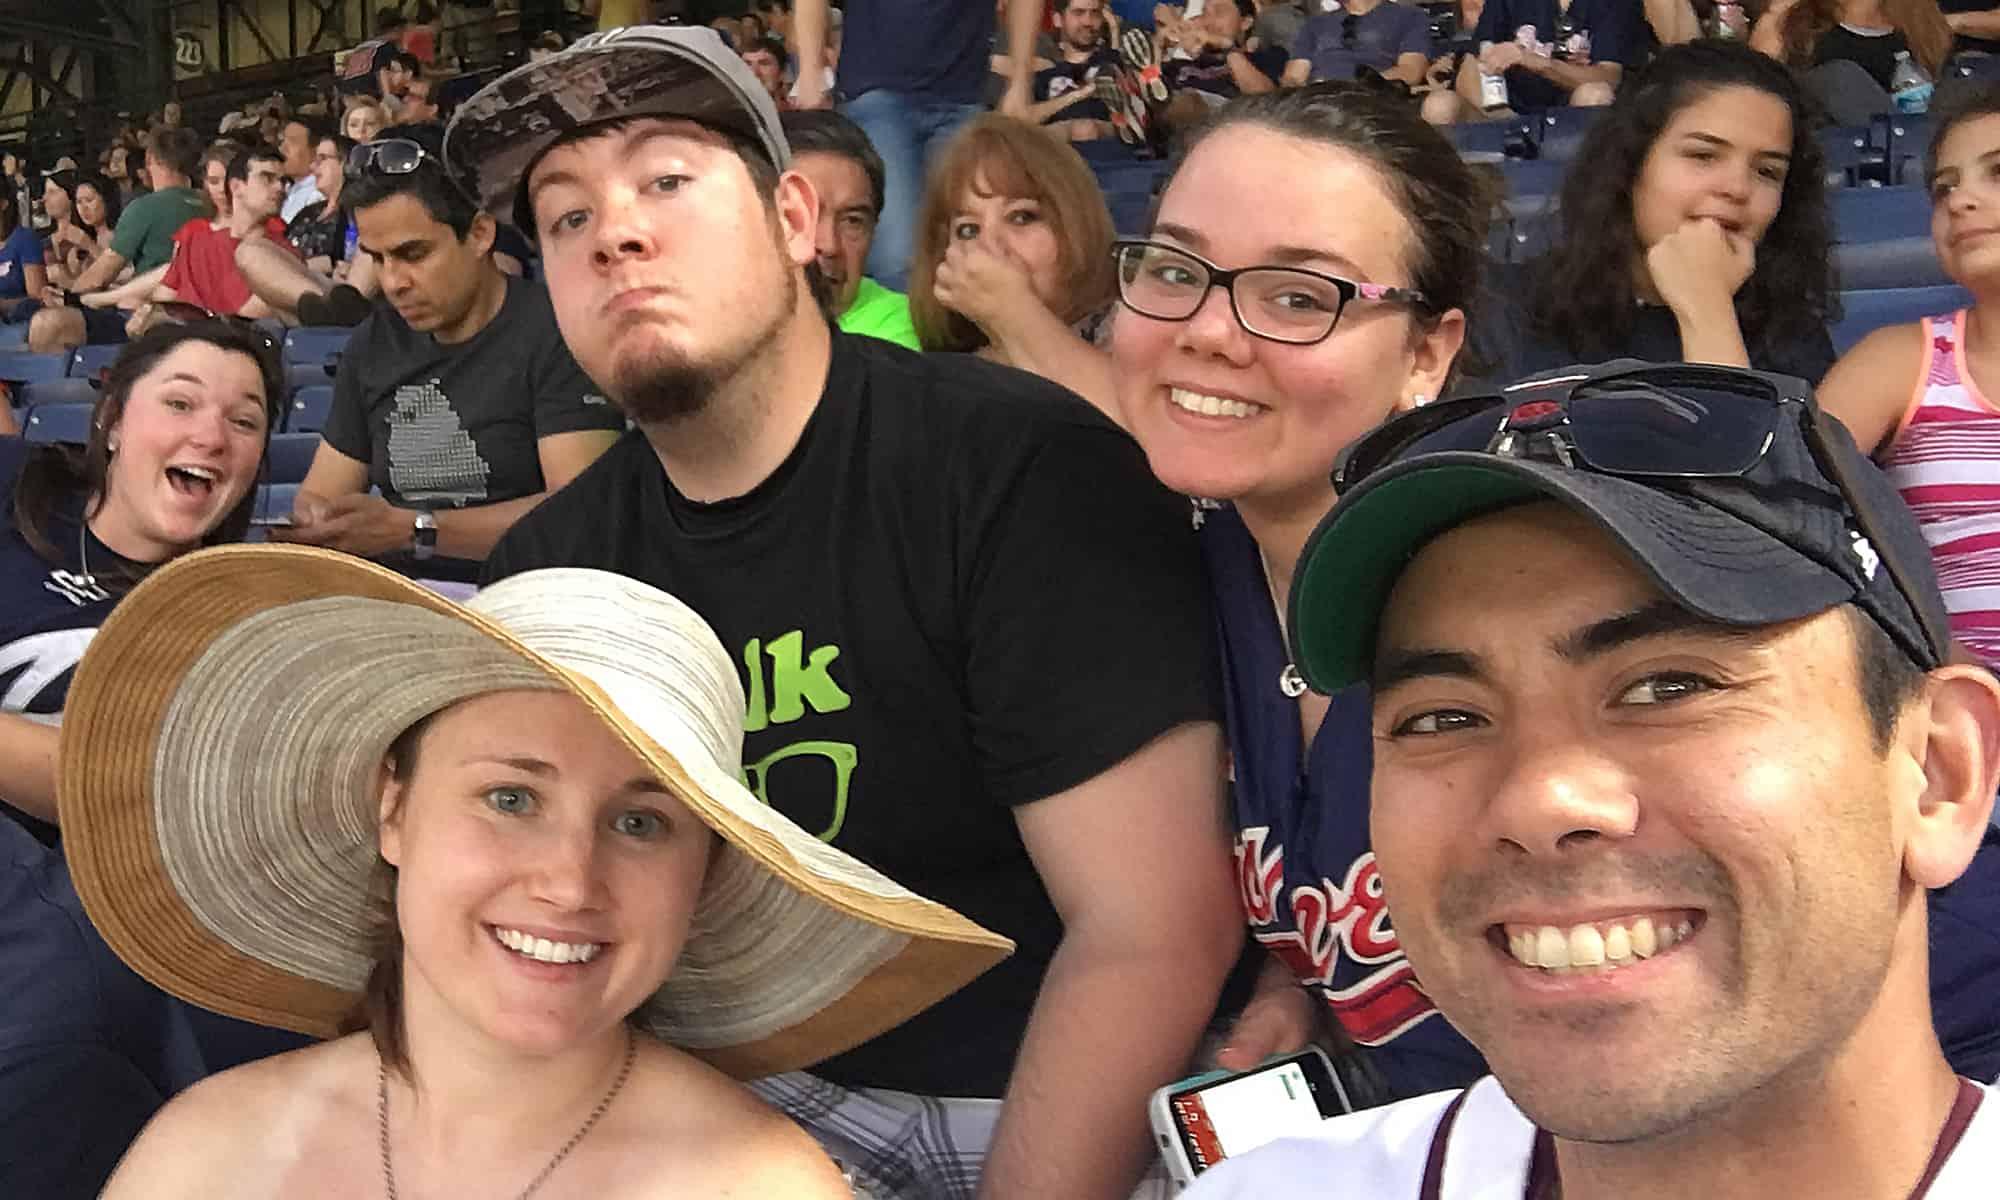 M-&-K-Braves-game-2016